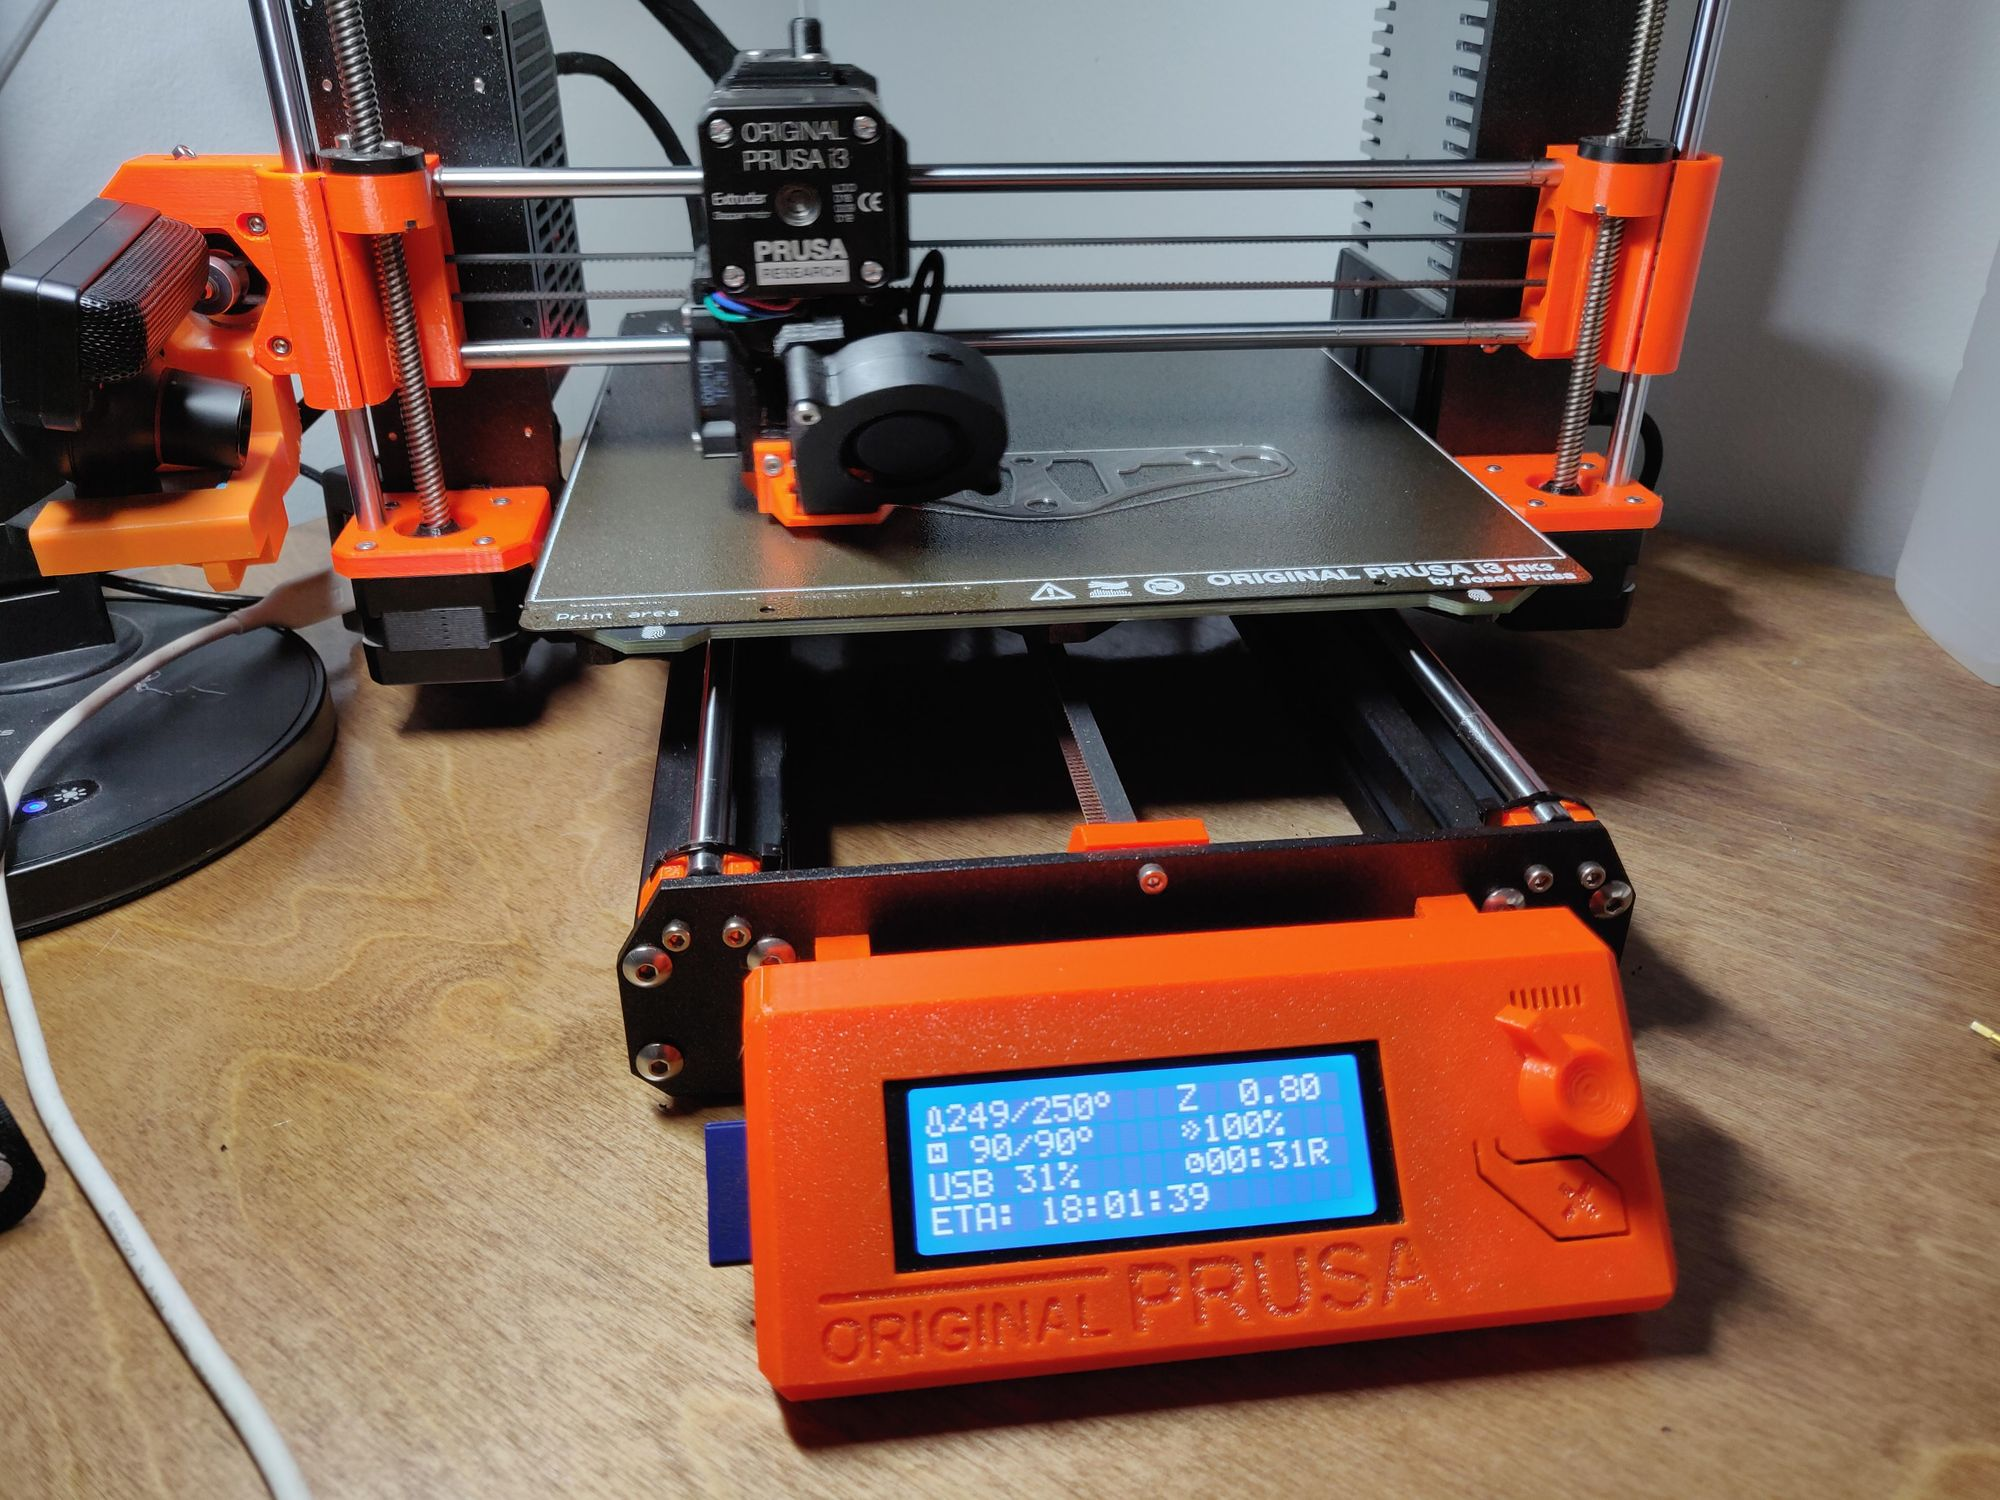 Eliminate 3d Printing Mesh Bed Leveling Globs on a Prusa i3 MK3